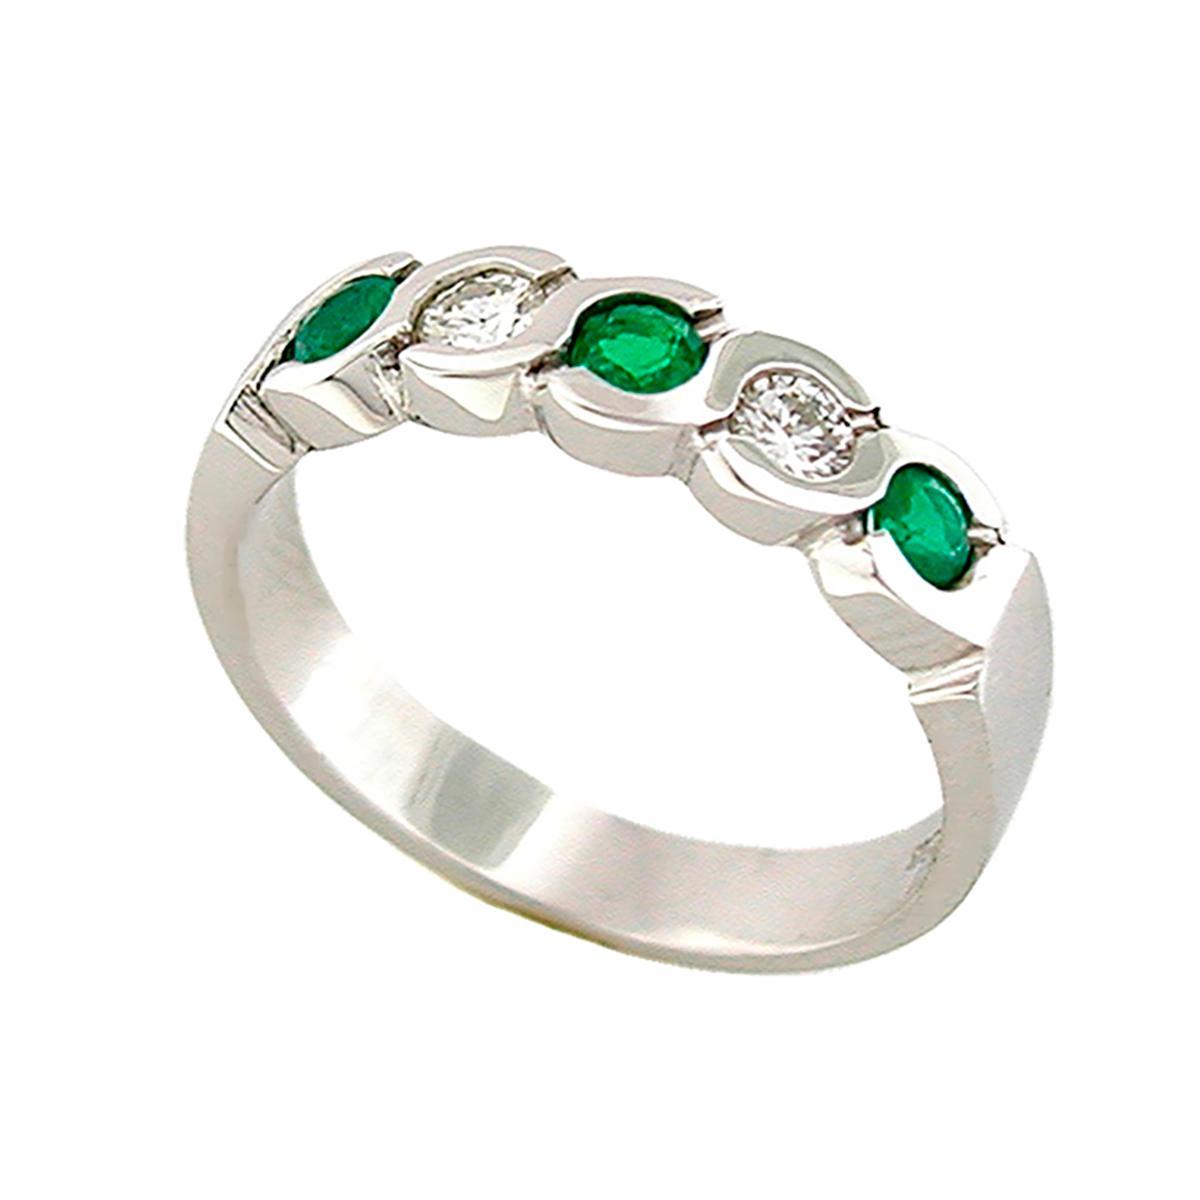 emerald-and-diamond-half-eternity-wedding-band-in-18k-white-gold-bezel-setting